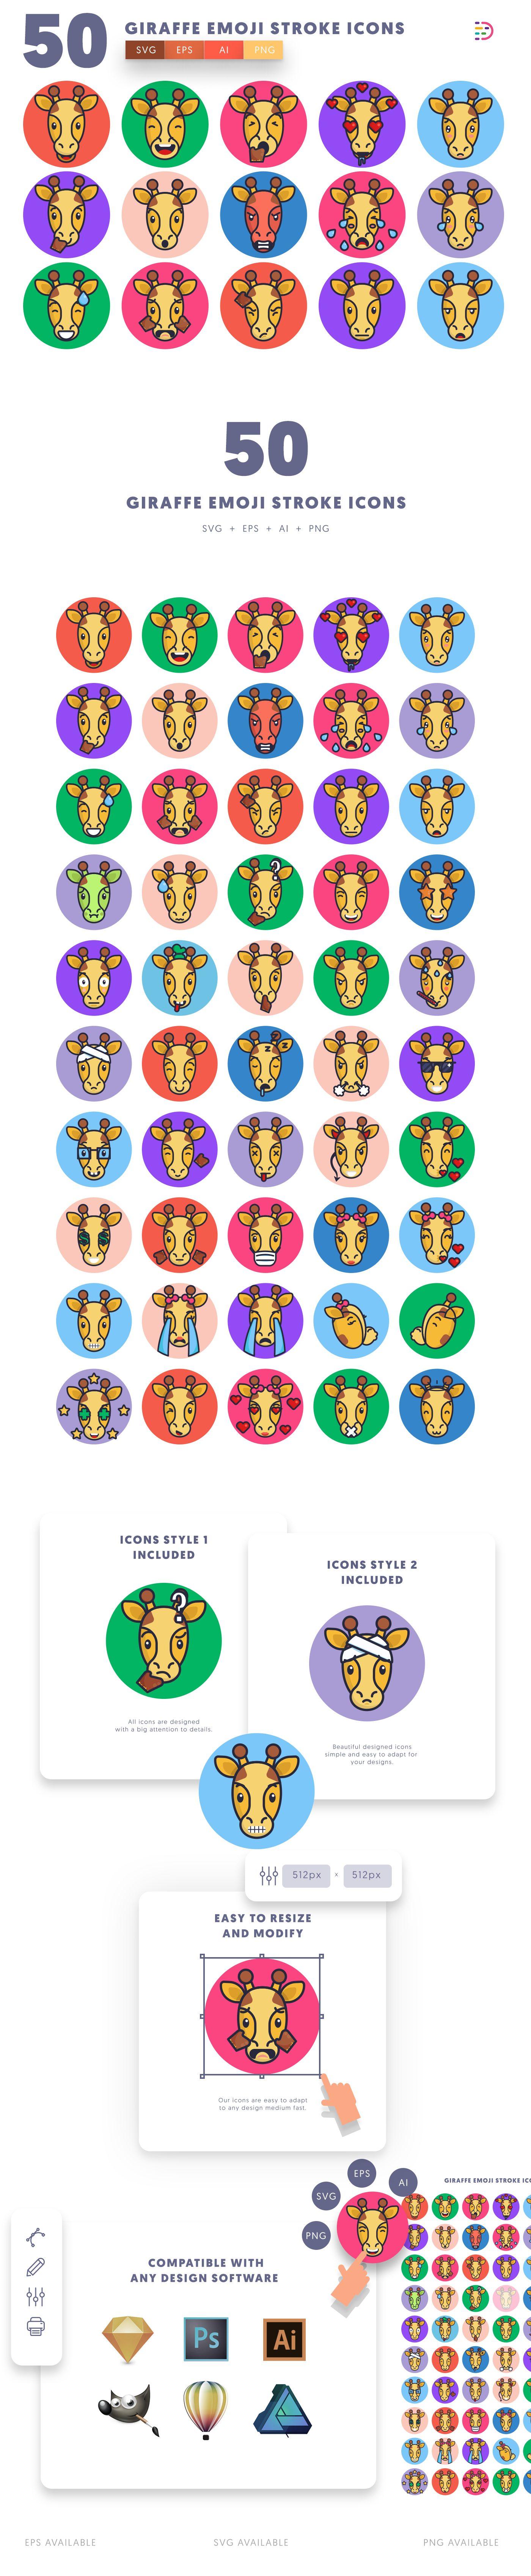 Giraffe Emoji Stroke icons info graphic